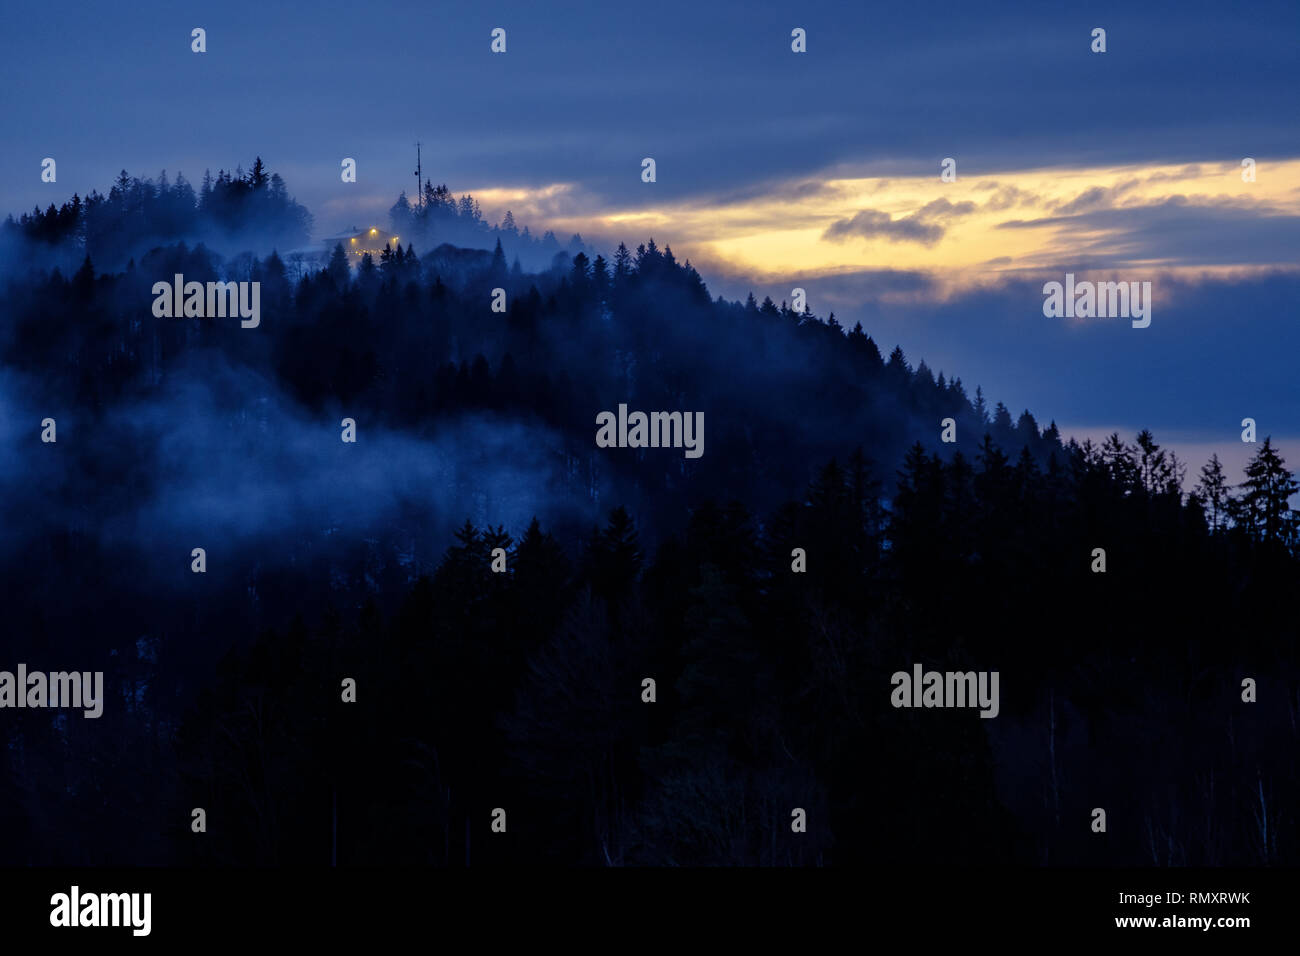 Nebel - Stock Image